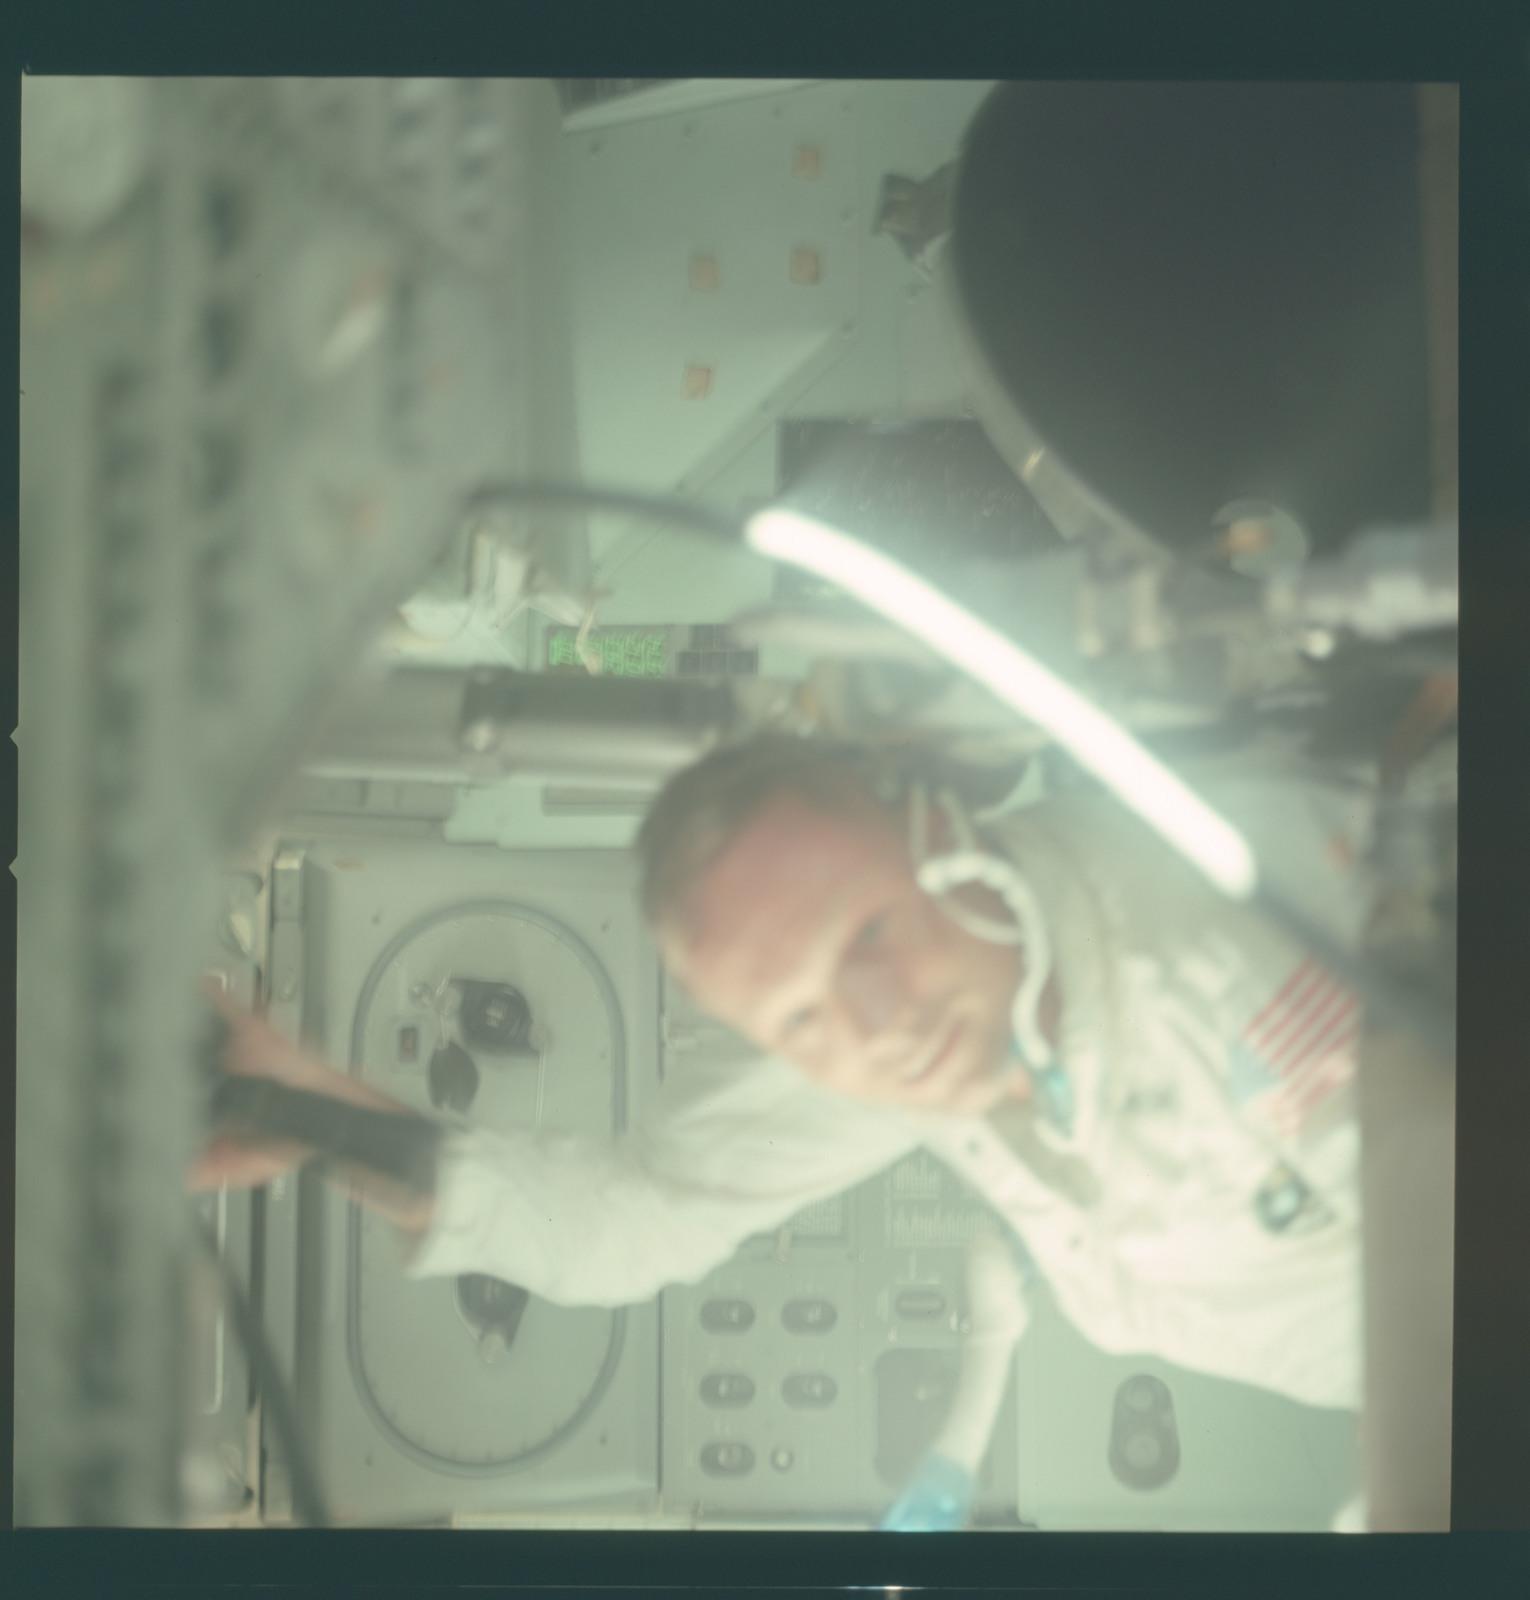 AS11-36-5388 - Apollo 11 - Apollo 11 Mission image - Astronaut inside the Lunar Module